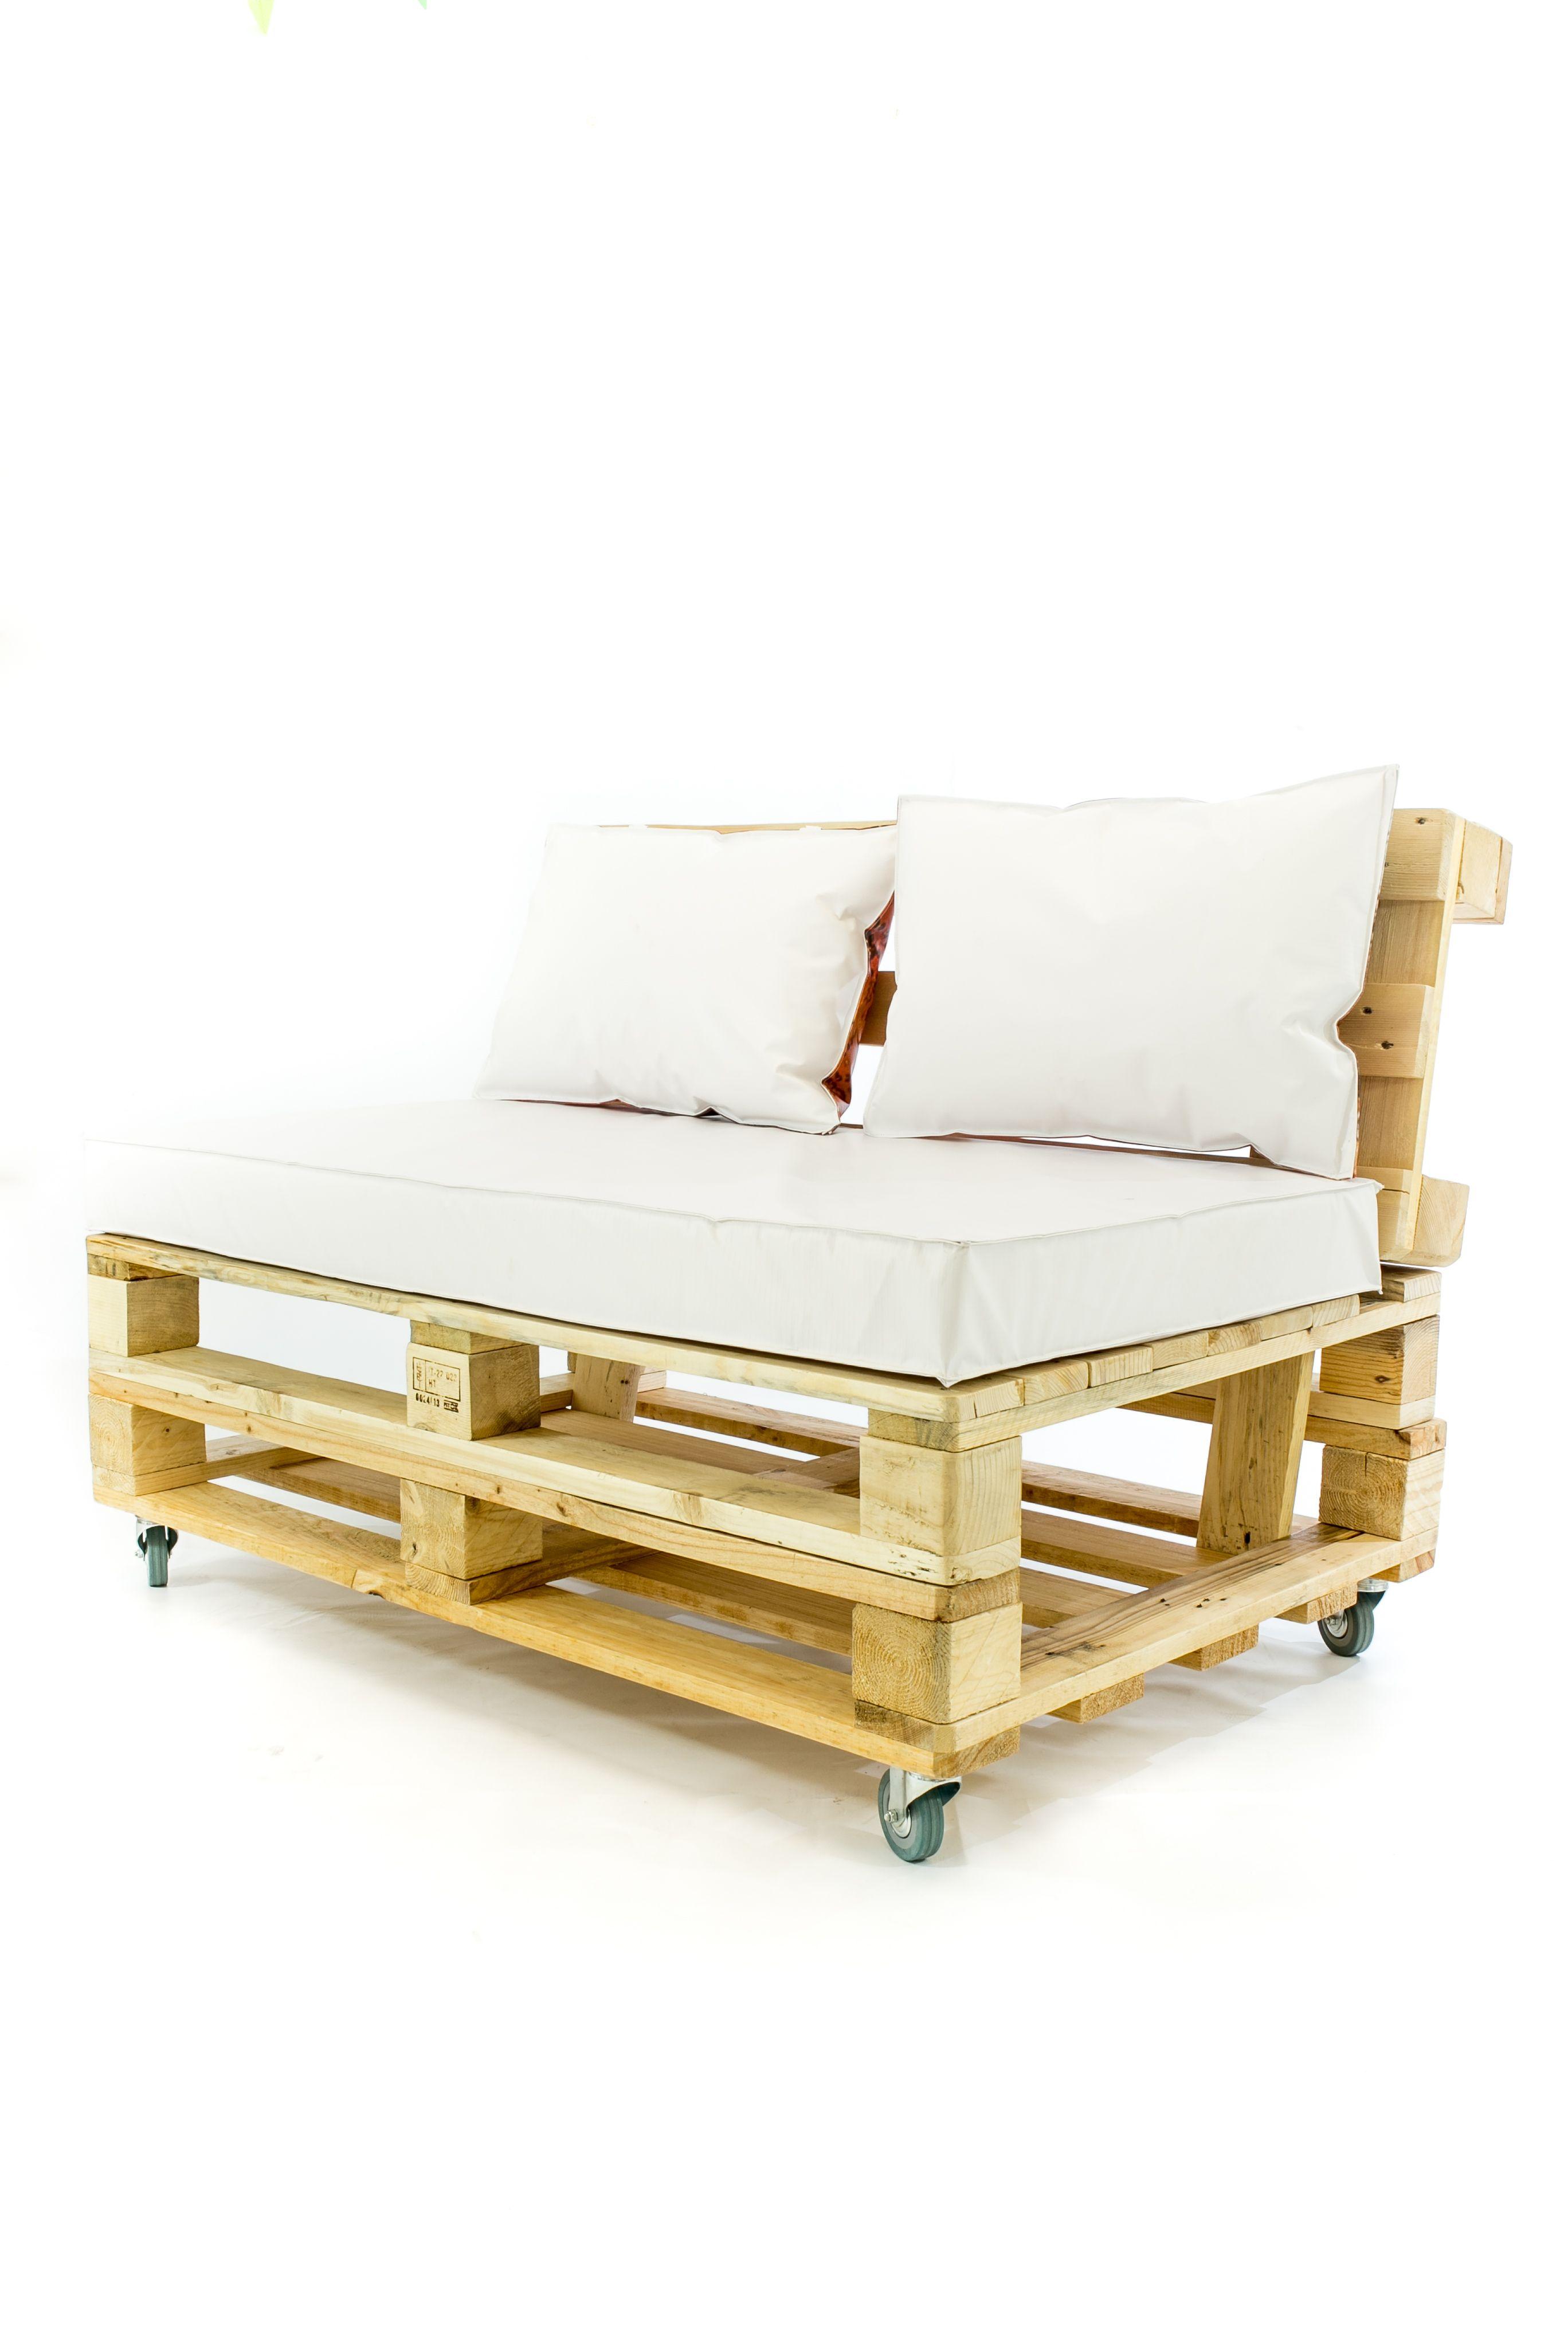 Meble Z Palet Wycieczka Do Studia Nasza Kanapa Pallets Meblezpalet Pallet Furniture Furniture Outdoor Furniture